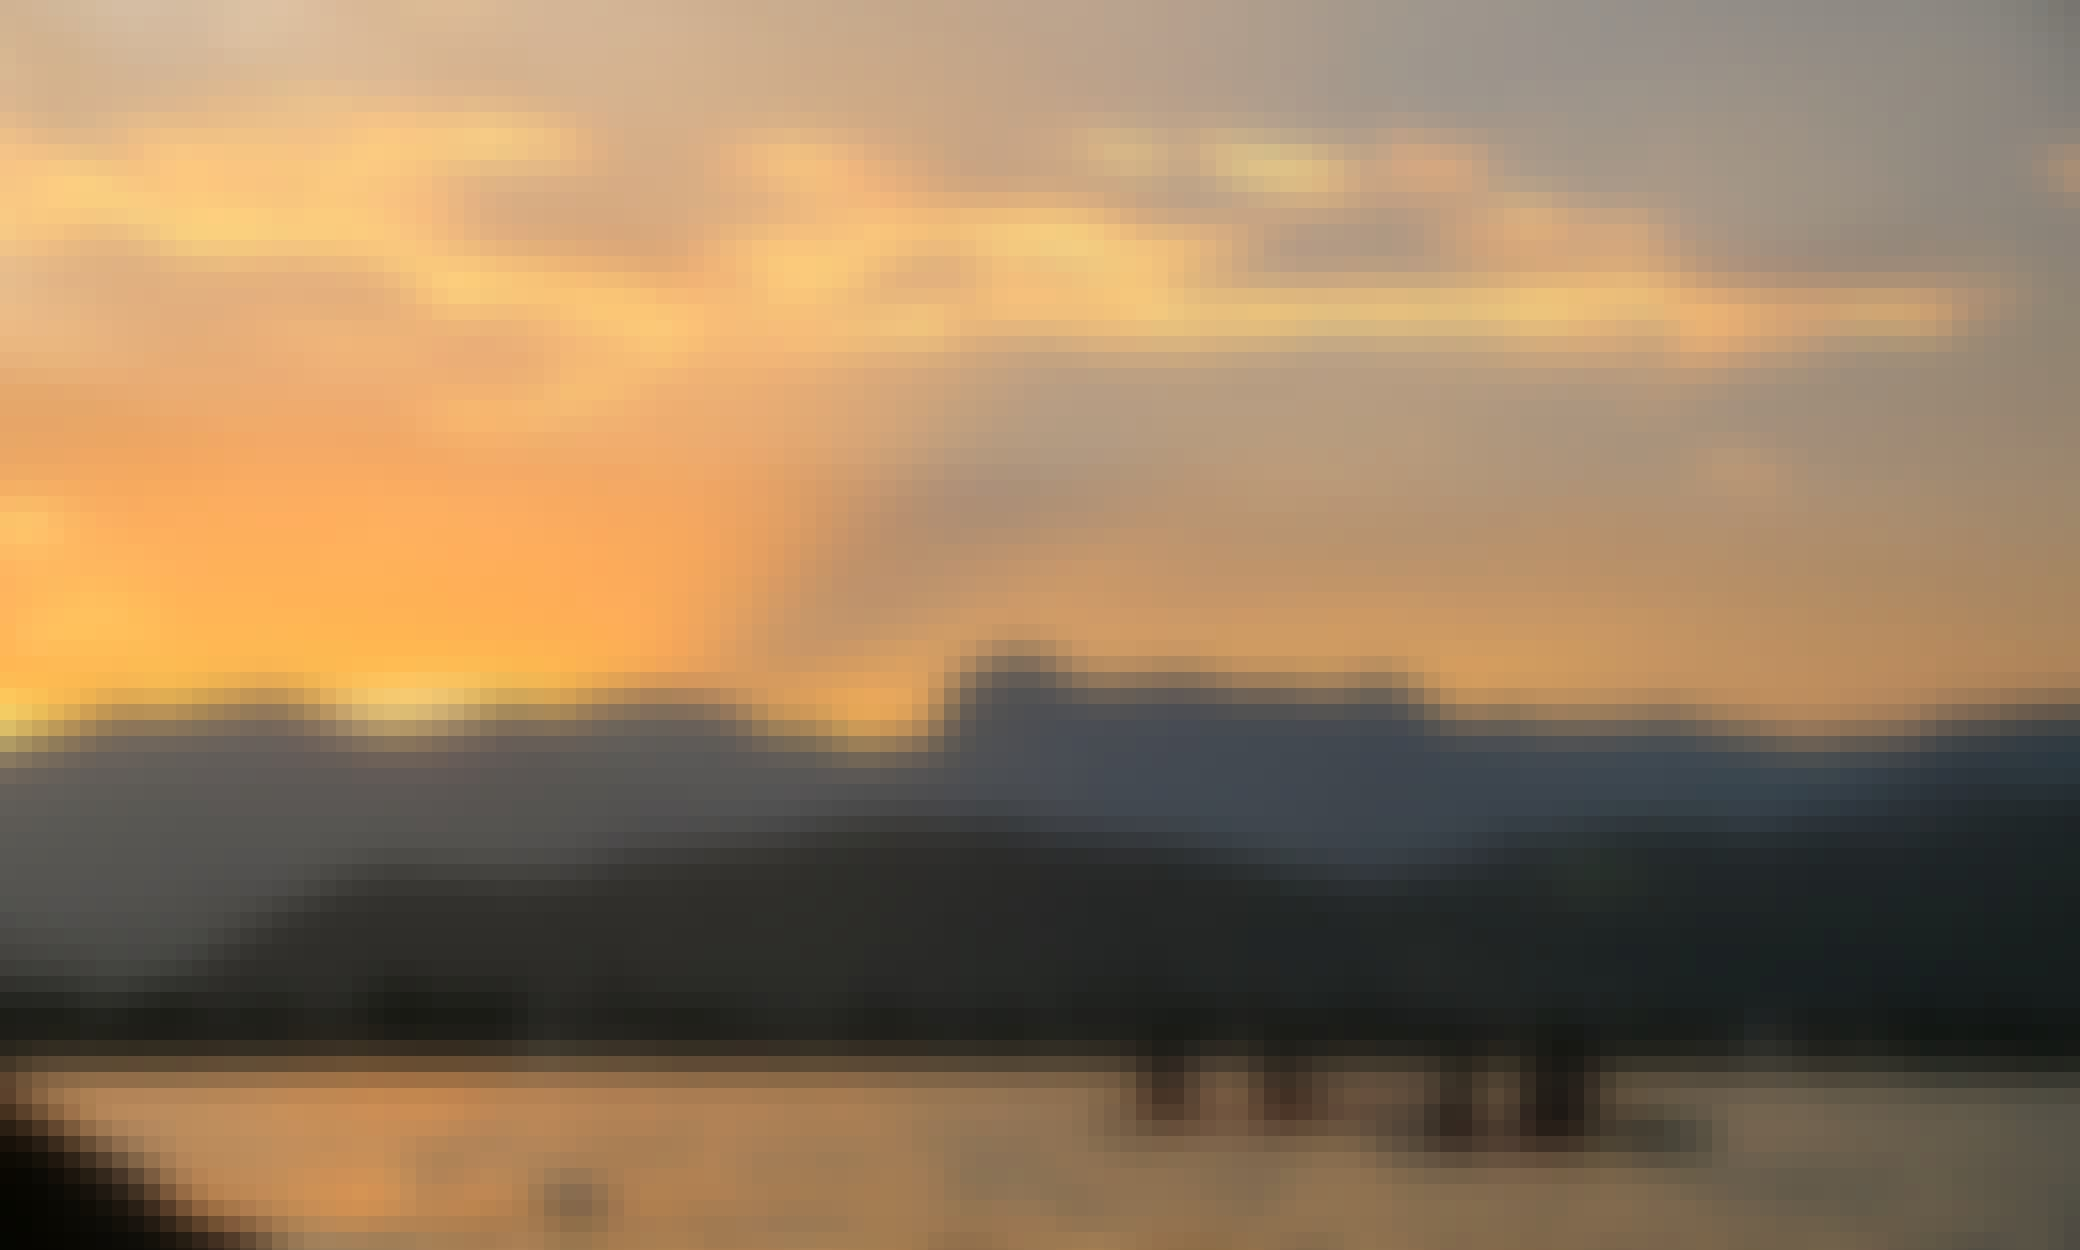 Sunset Paddling Guided Tour in Rio de Janeiro, Brazil